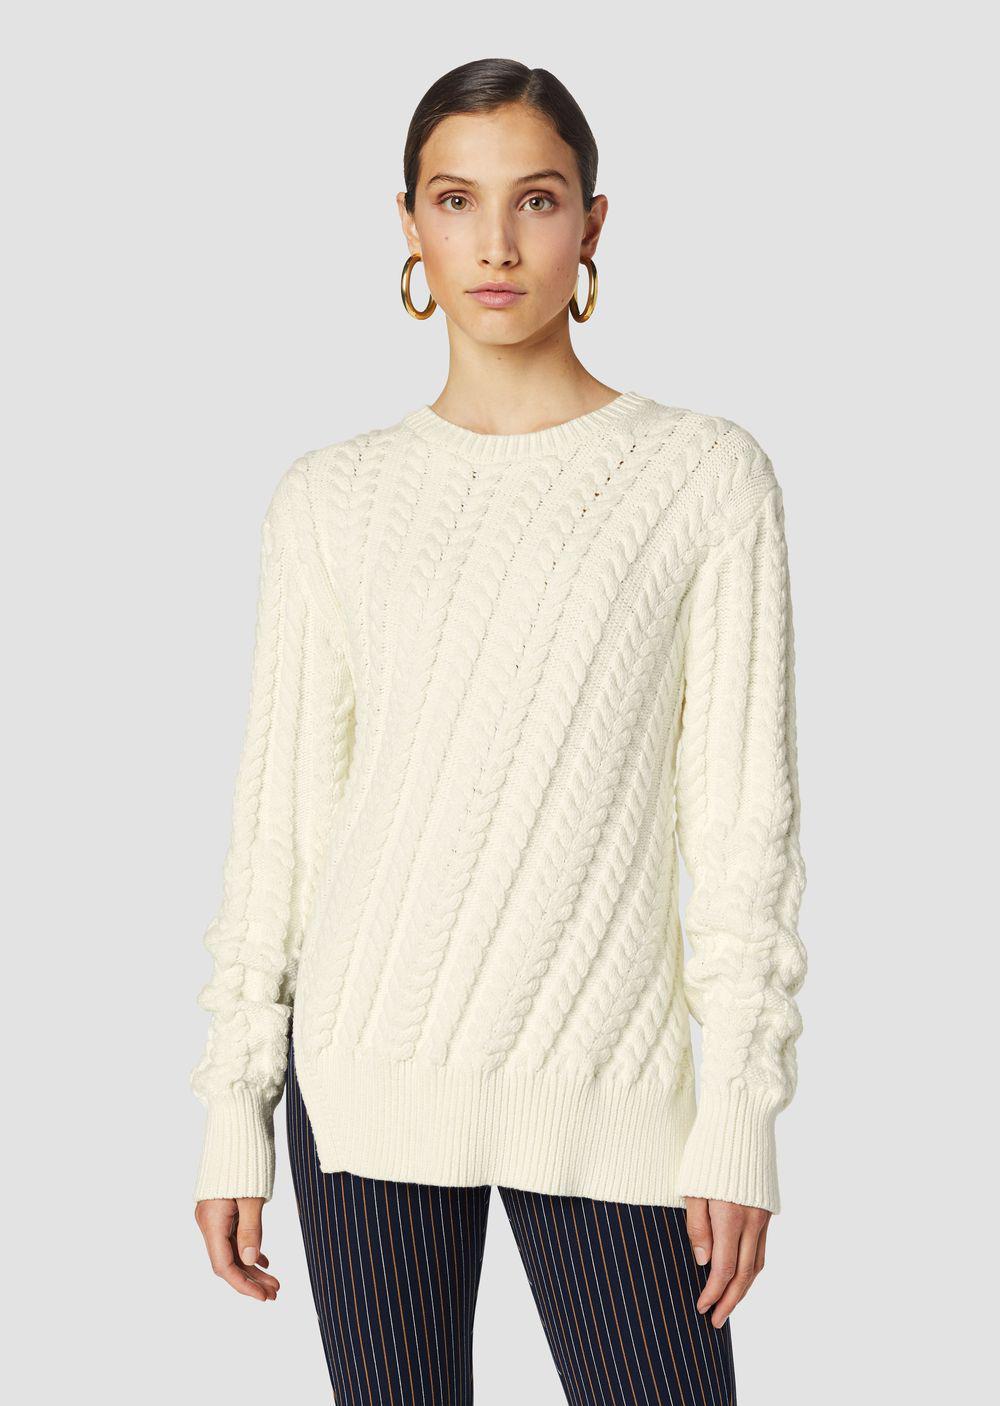 684a83f4e1 Lyst - 10 Crosby Derek Lam Crew Neck Sweater in White